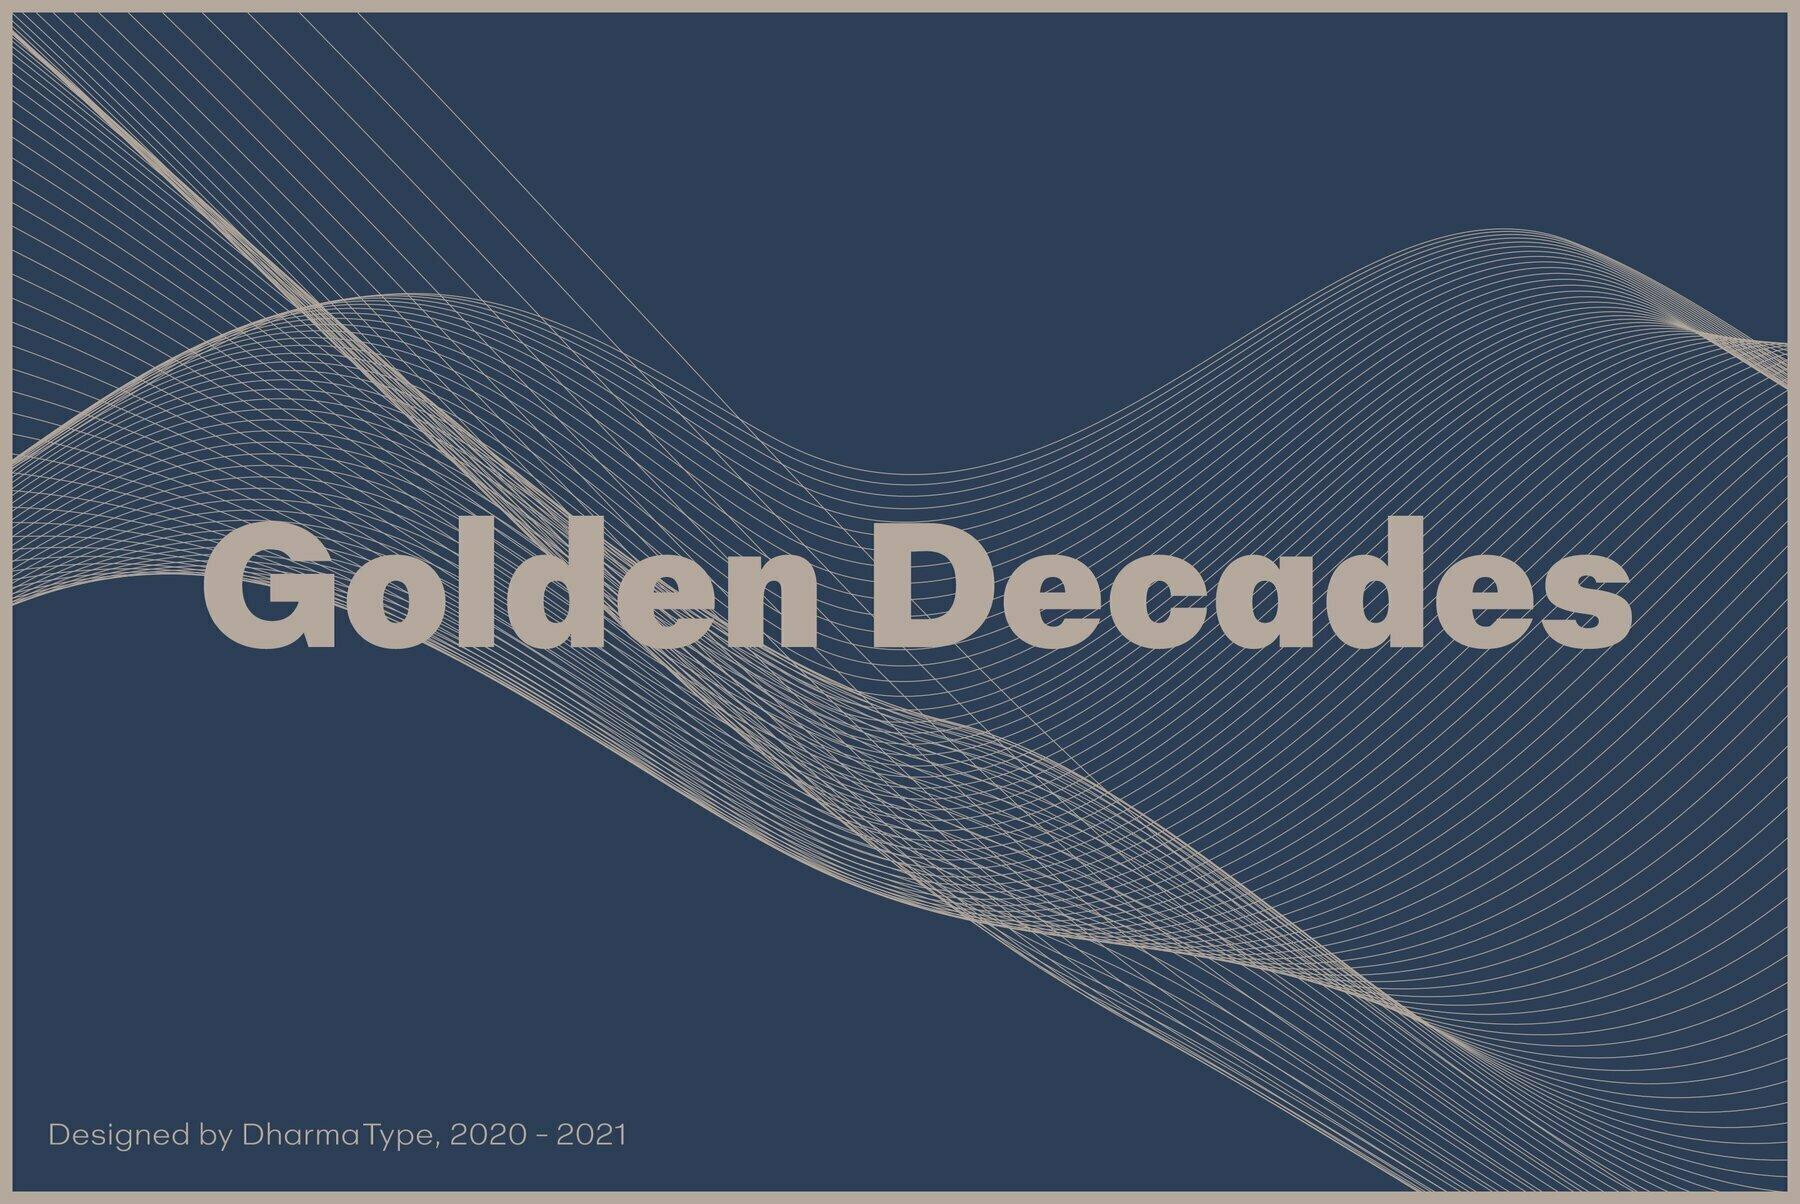 Golden Decades